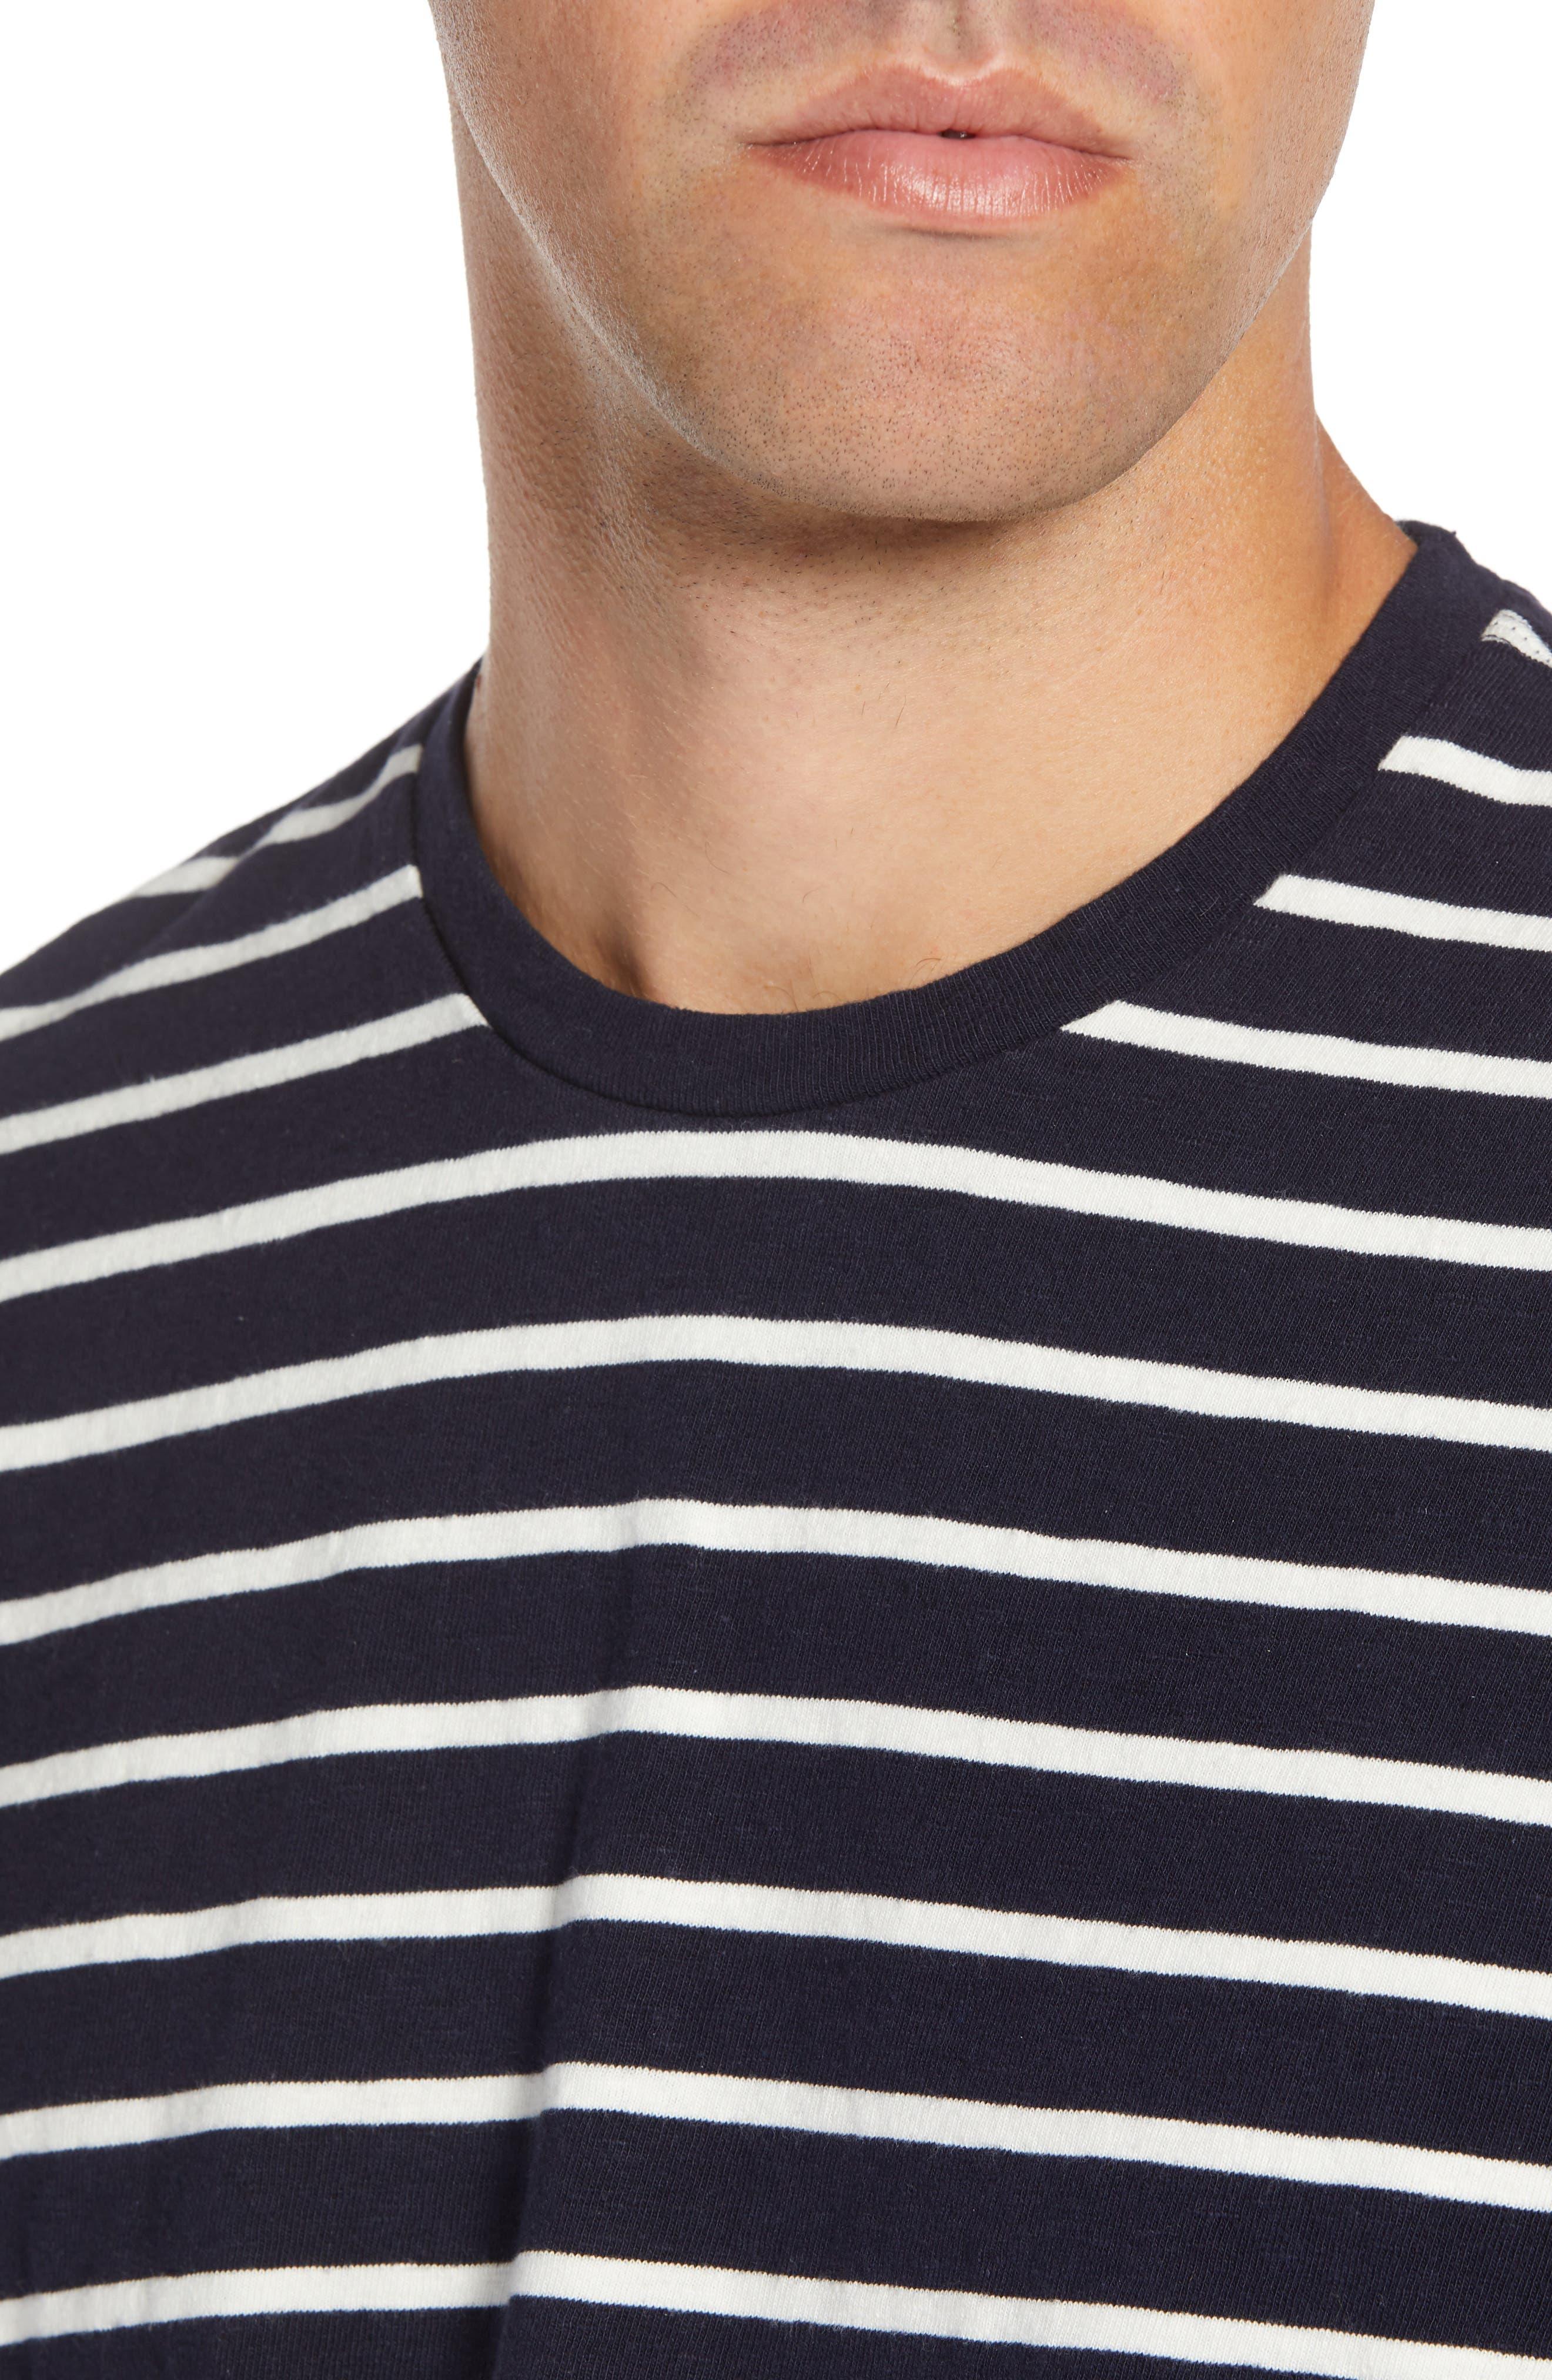 Stripe Long Sleeve T-Shirt,                             Alternate thumbnail 4, color,                             NAVY NIGHT ECRU STRIPE